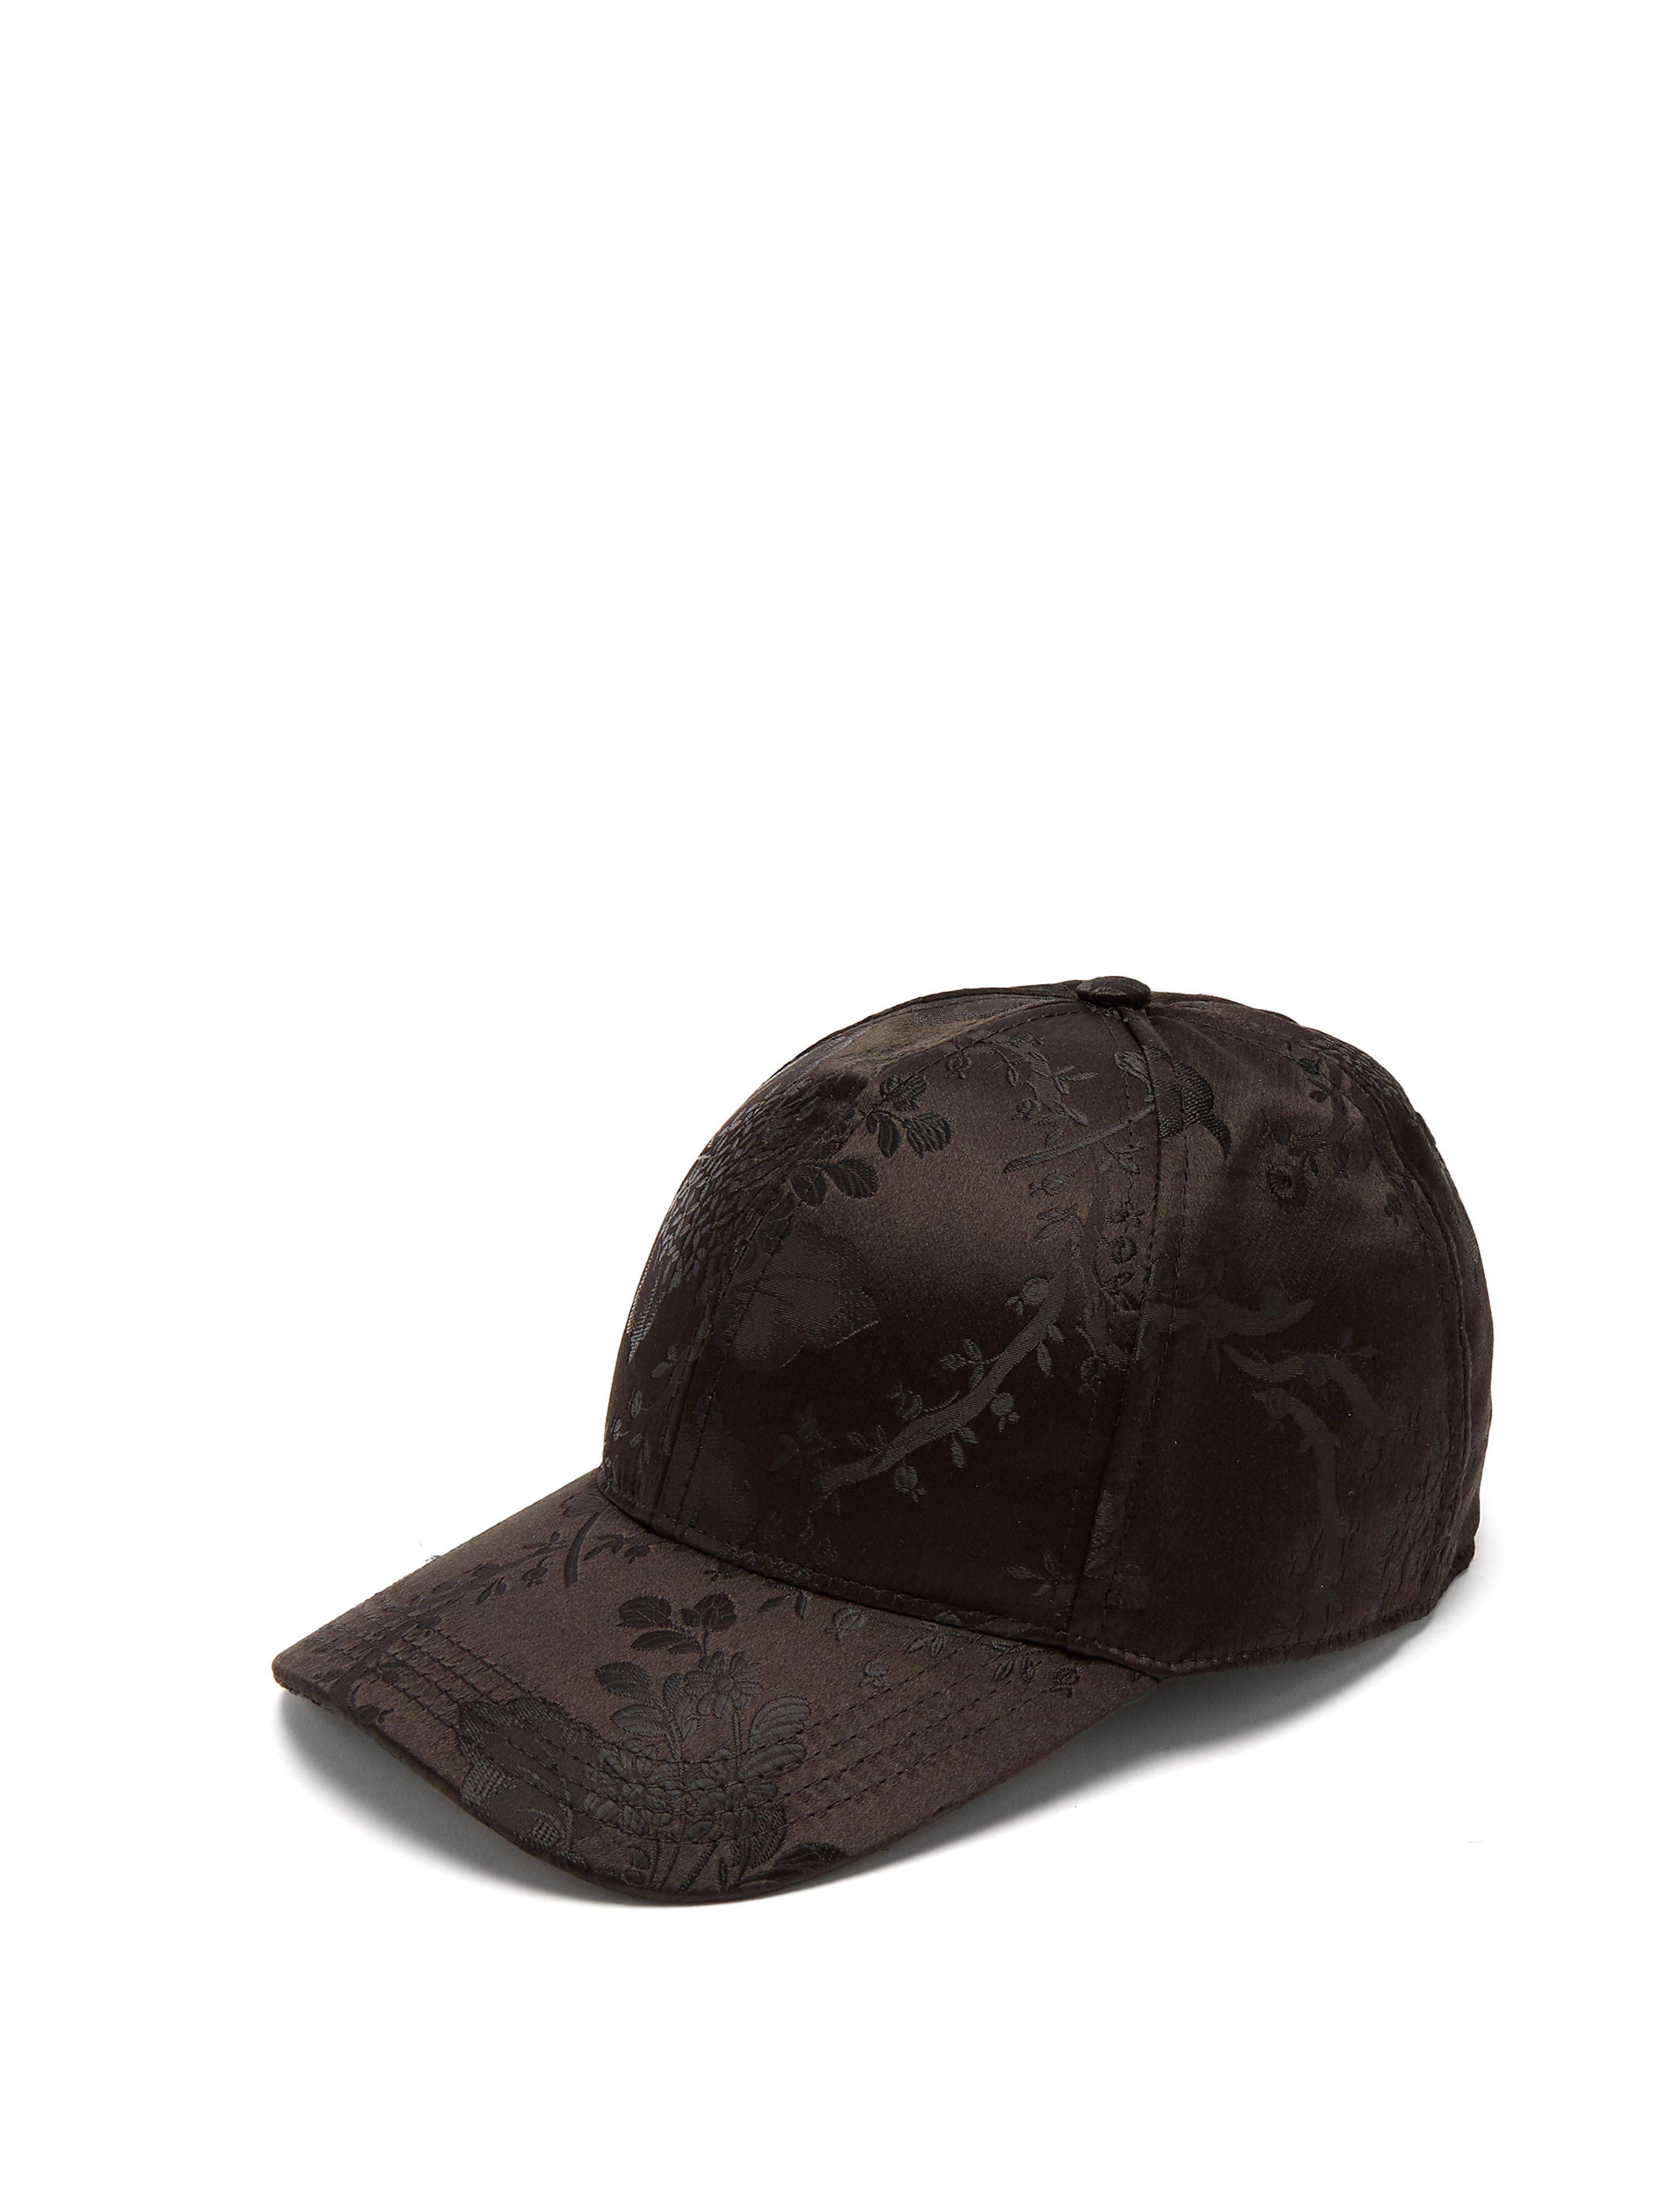 4414f4d7460 Dolce   Gabbana Floral Jacquard Baseball Cap in Black for Men - Lyst